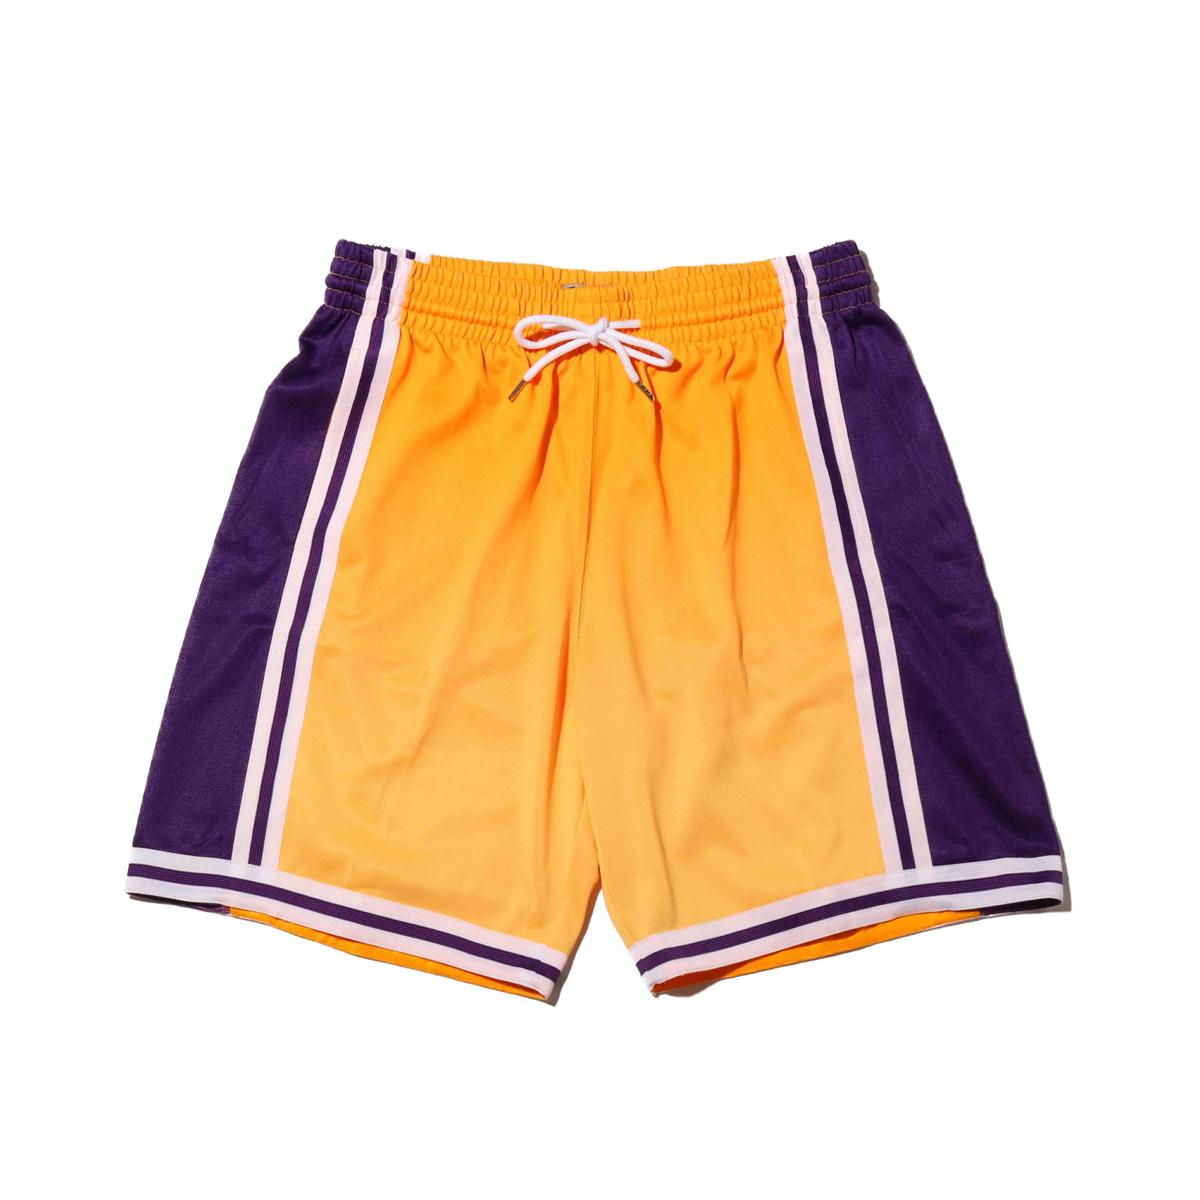 Mitchell & Ness Old English Swingman Shorts LA.Lakers(YELLOW)(ミッチェルアンドネス オールドイングリッシュ ショーツ/ロサンゼルスレイカーズ)【メンズ】【ハーフパンツ】【19HO-I】